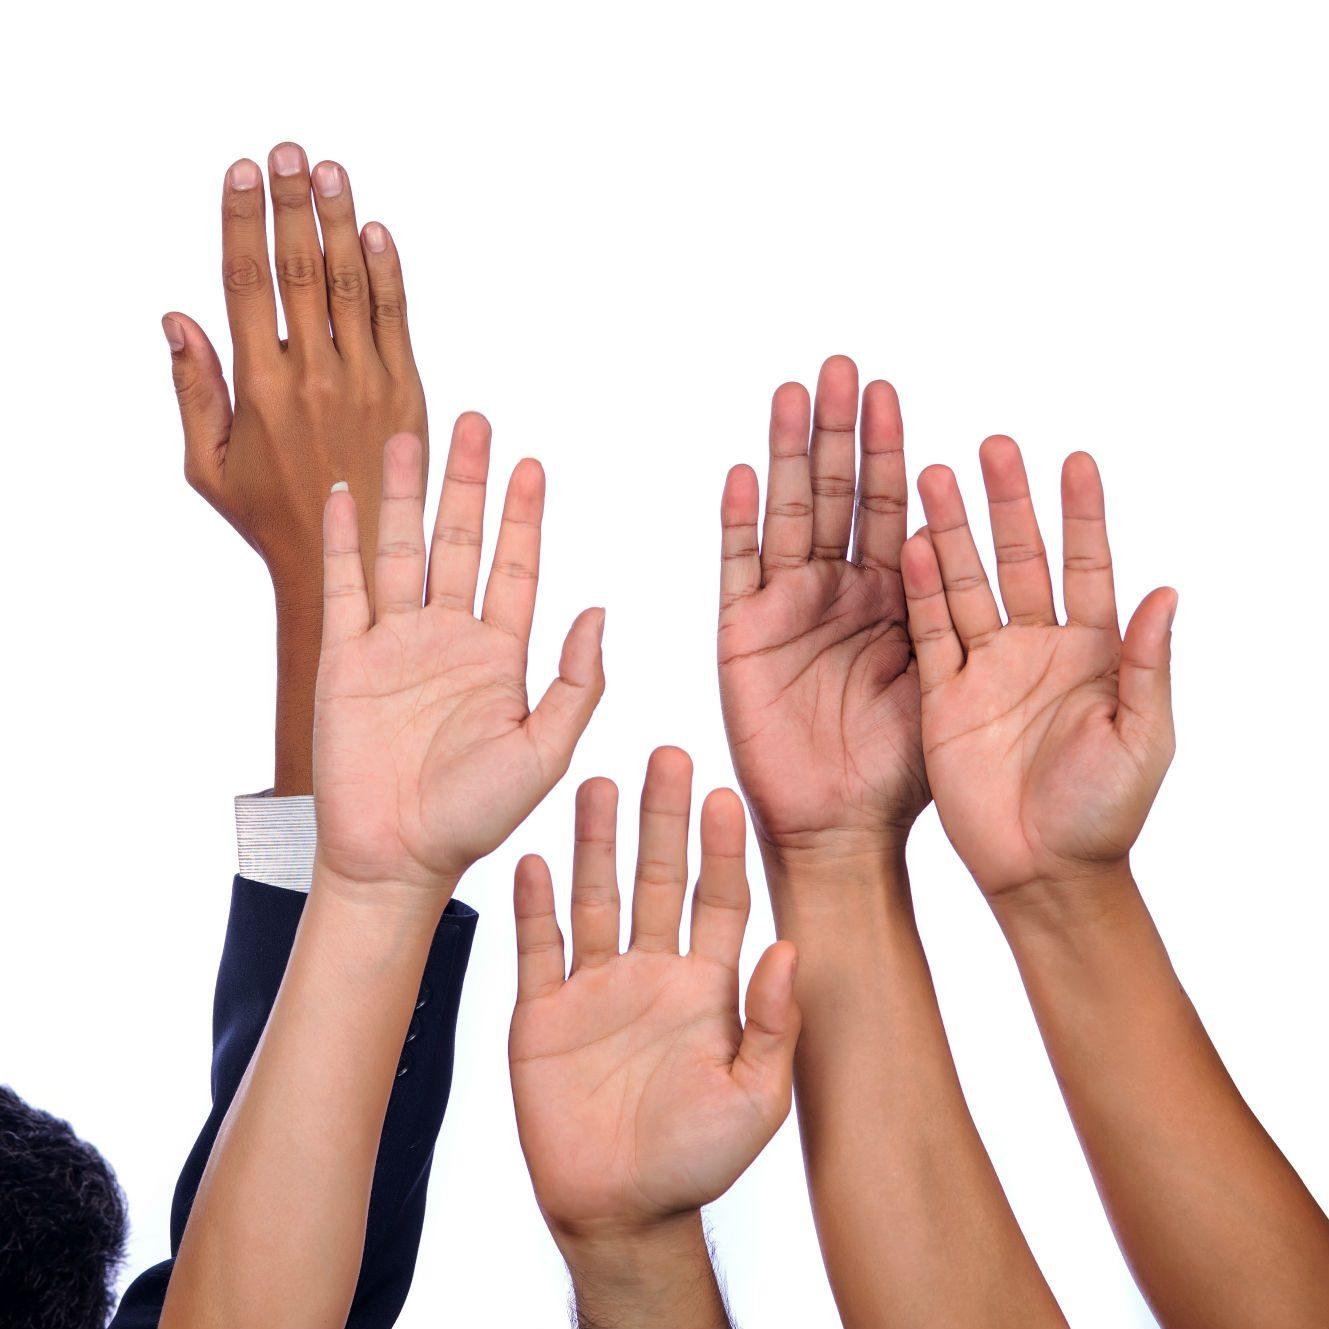 hands raised get involved